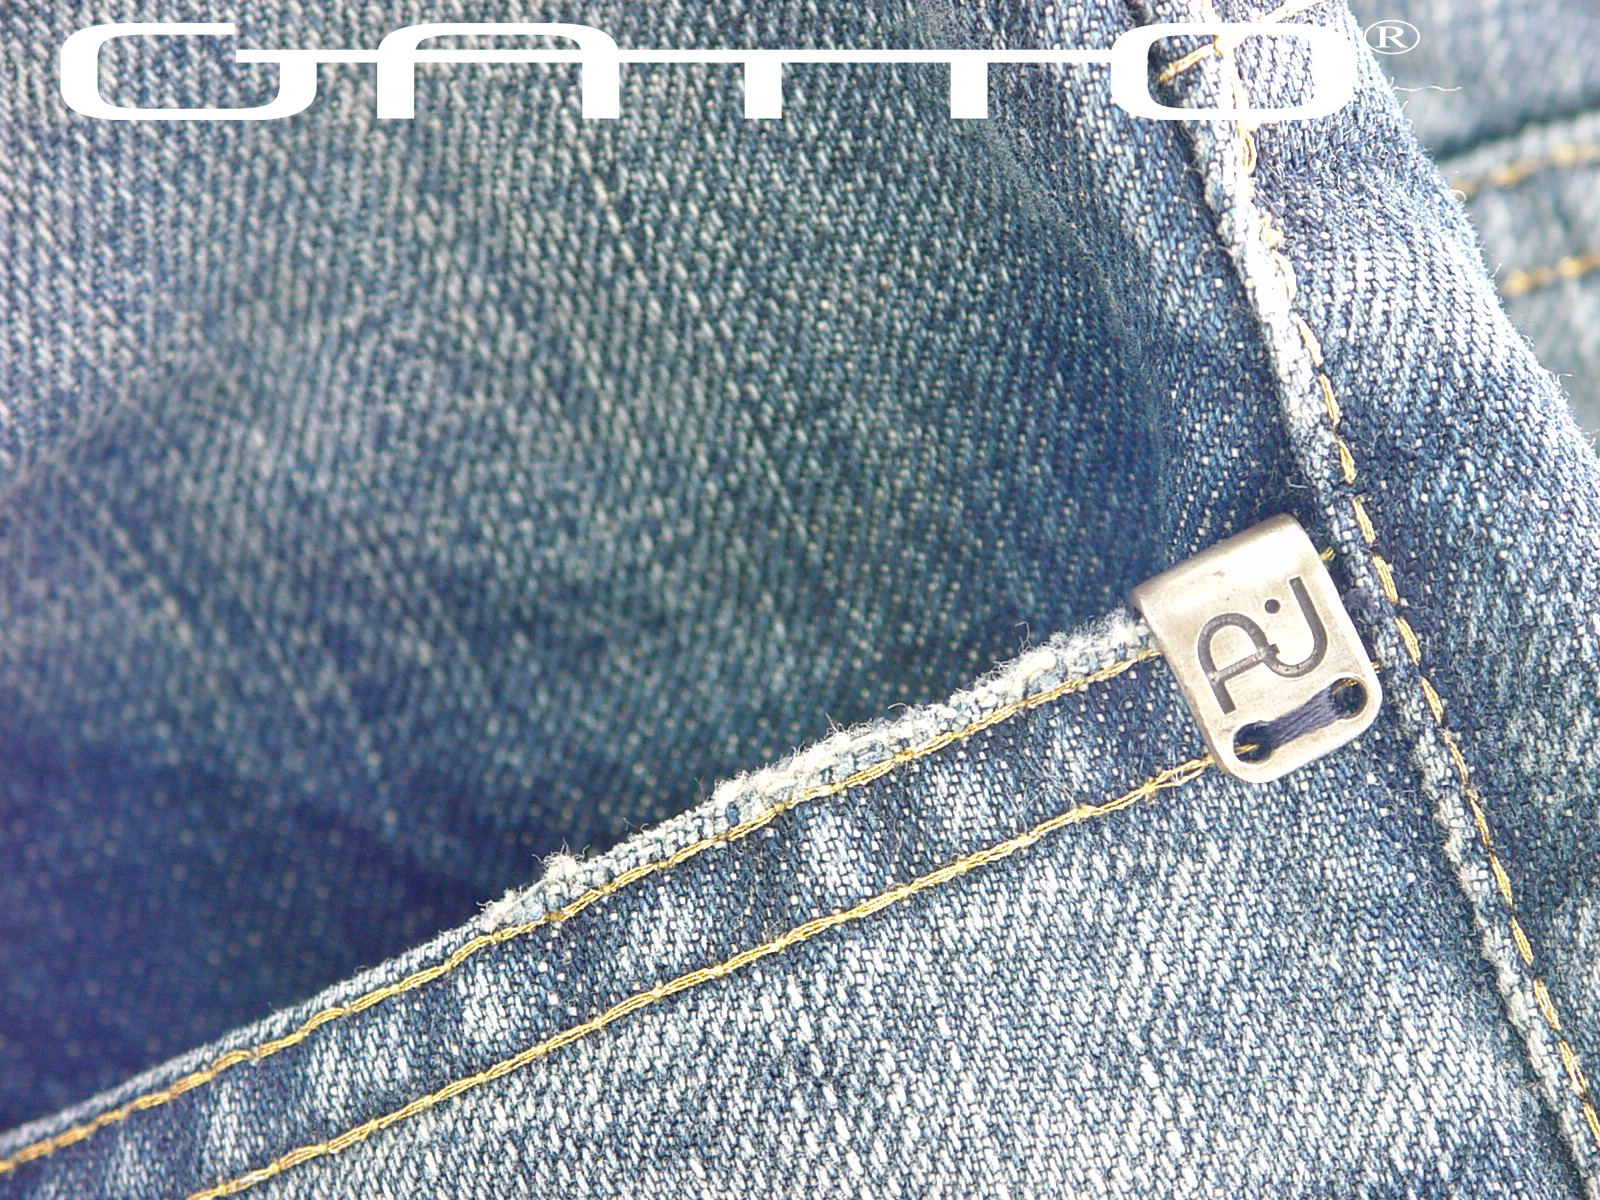 GRAFFETTA 01